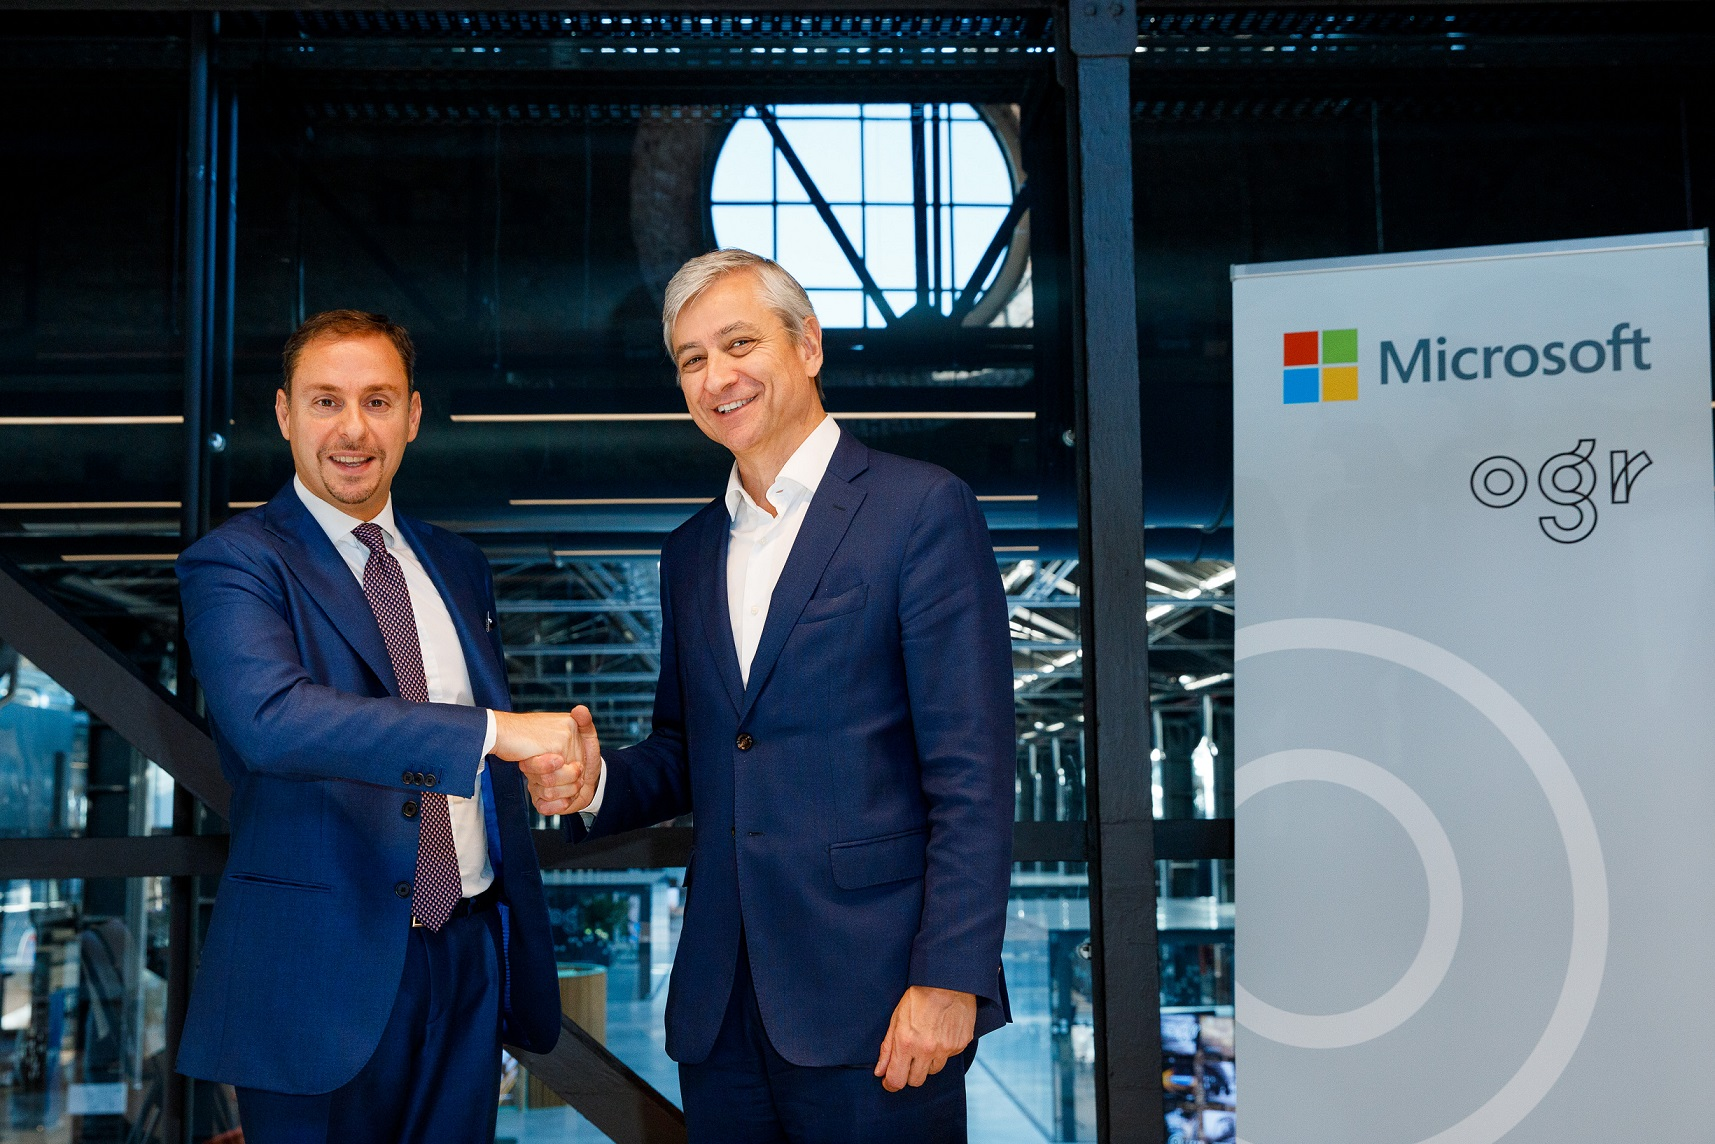 Microsoft e OGR insieme per sostenere le startup thumbnail